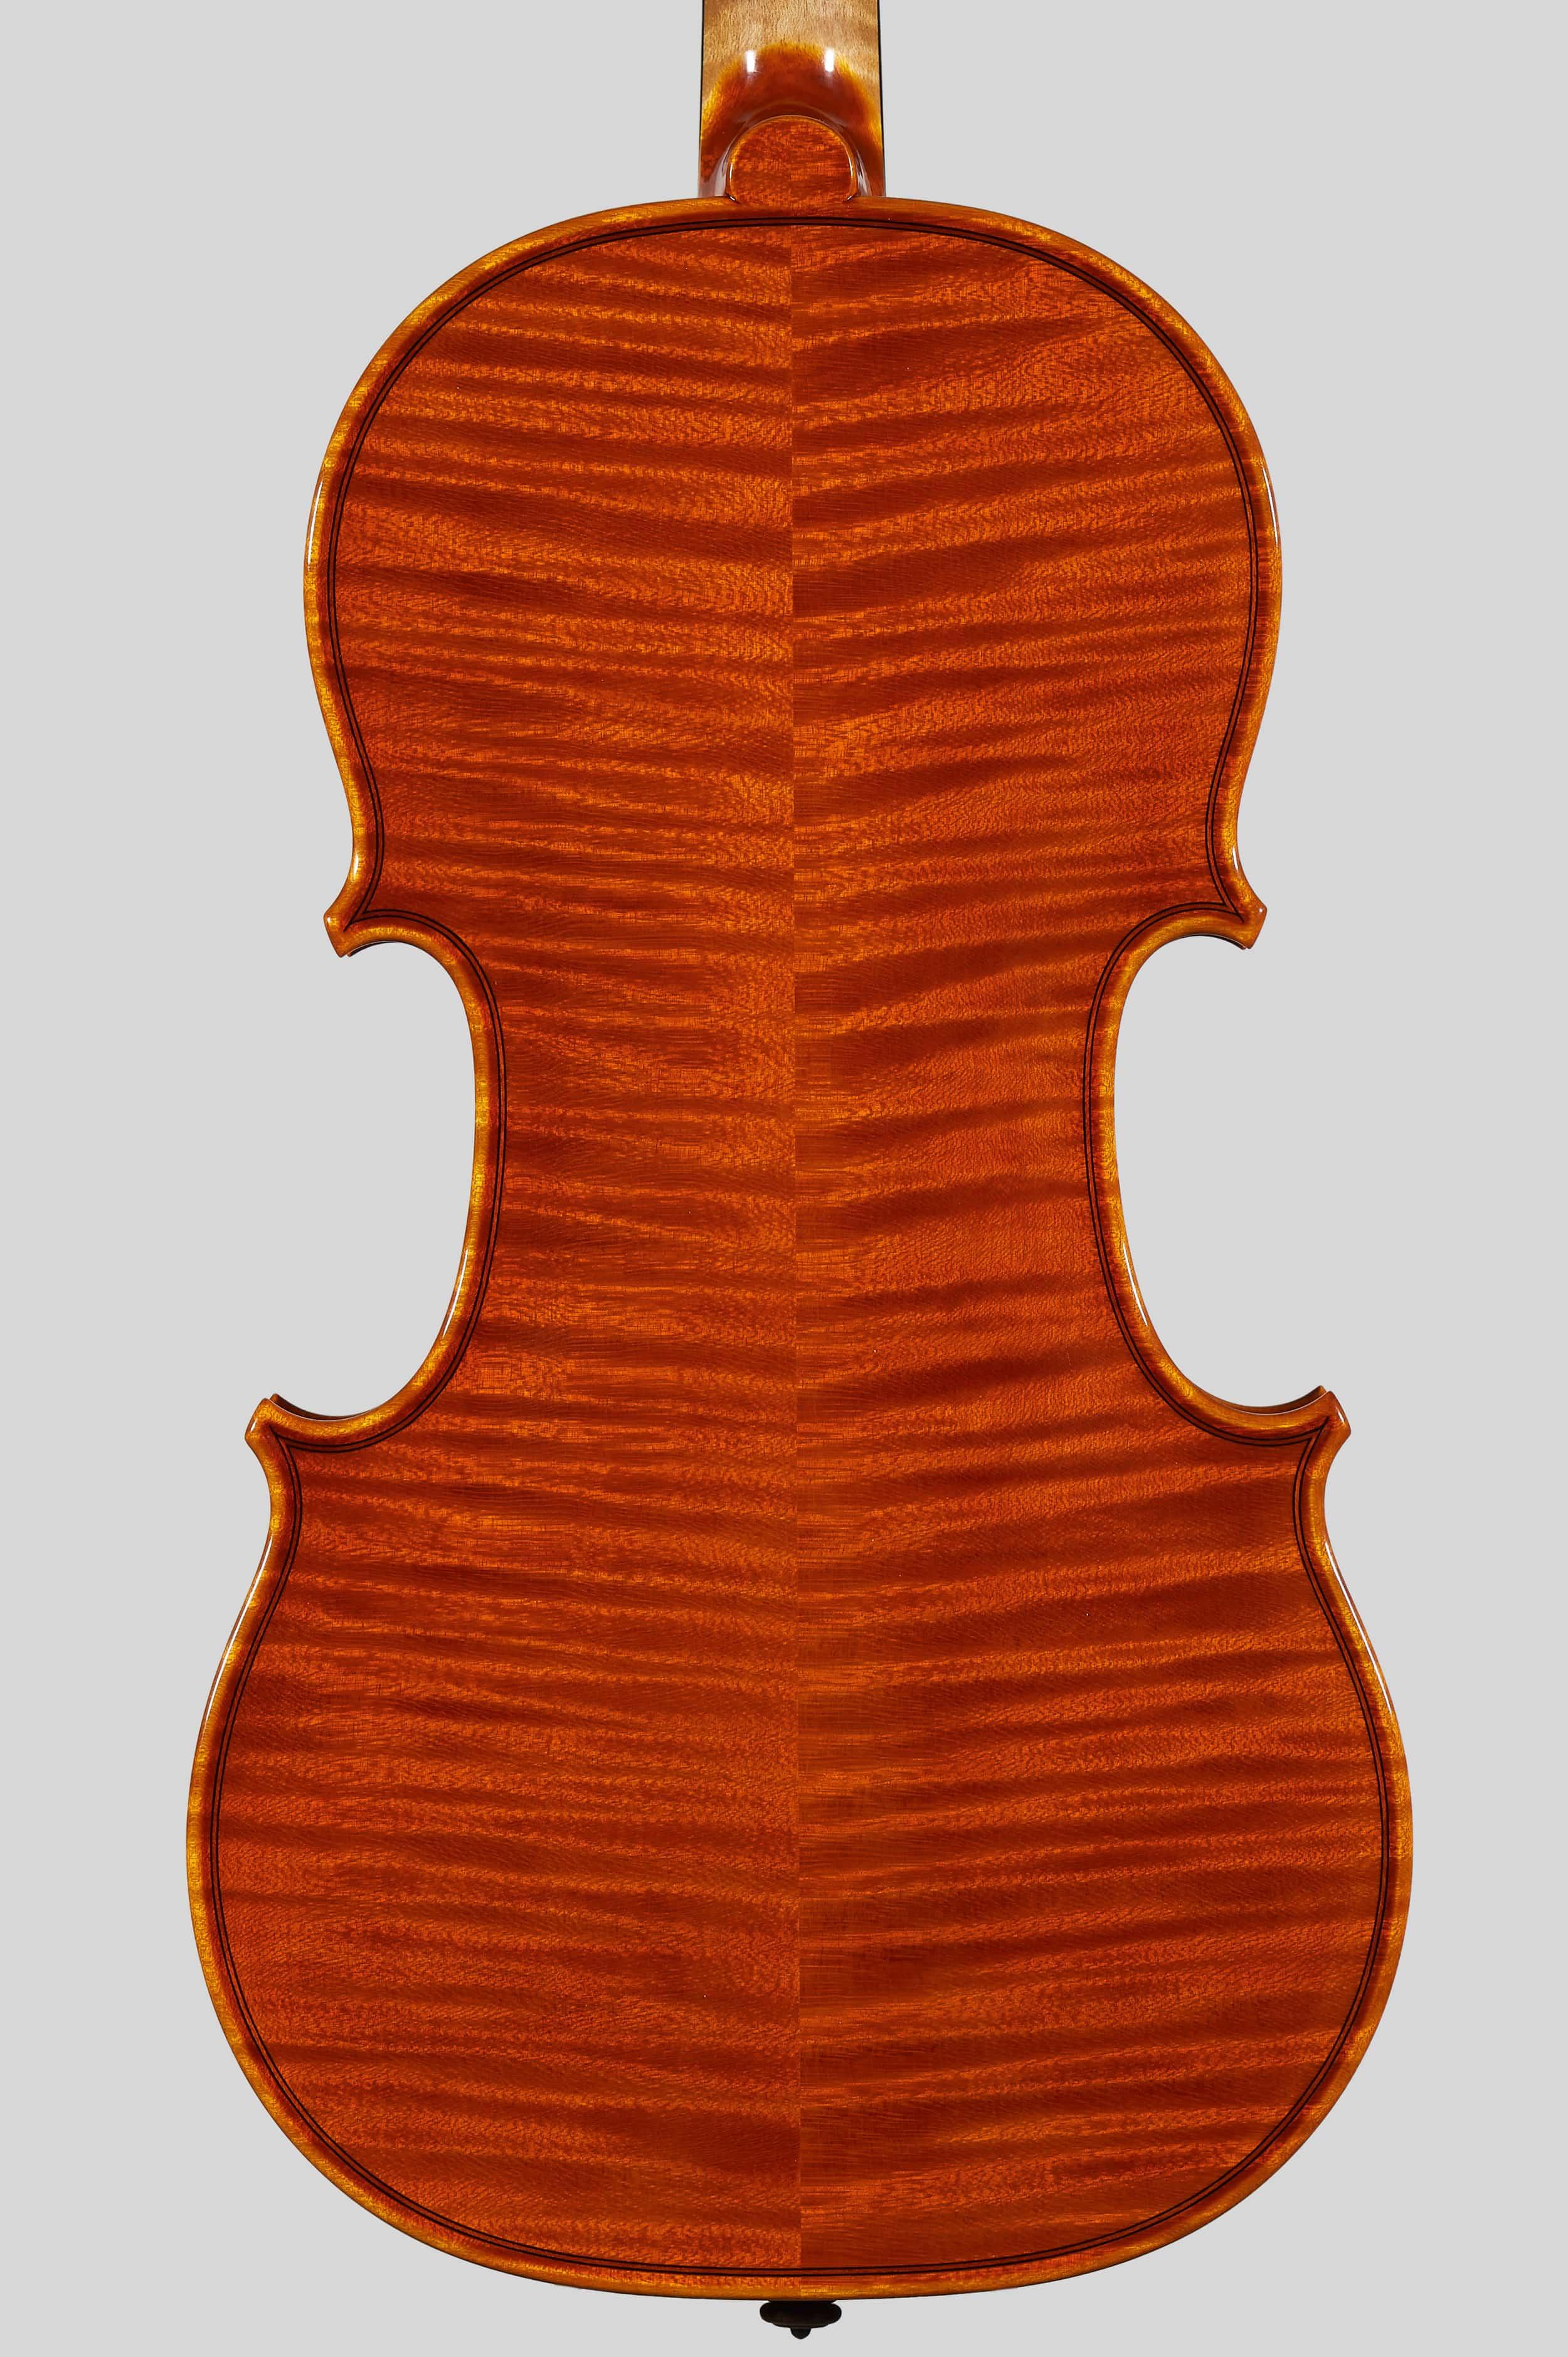 Anno 2014 violino modello stile a stradivari soil for Soil 1714 stradivarius